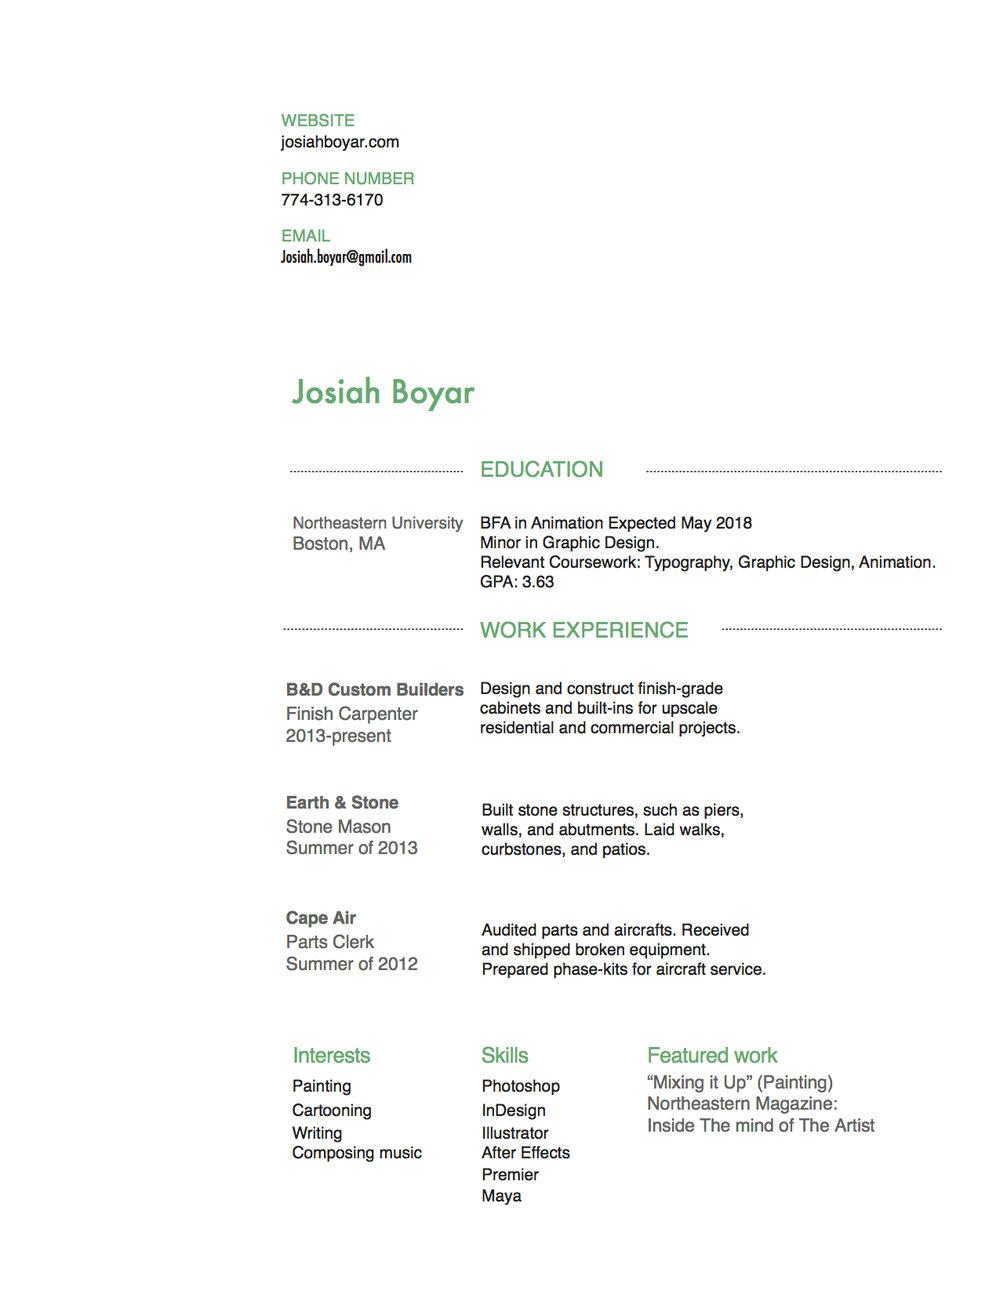 resume josiah boyar resume jpg